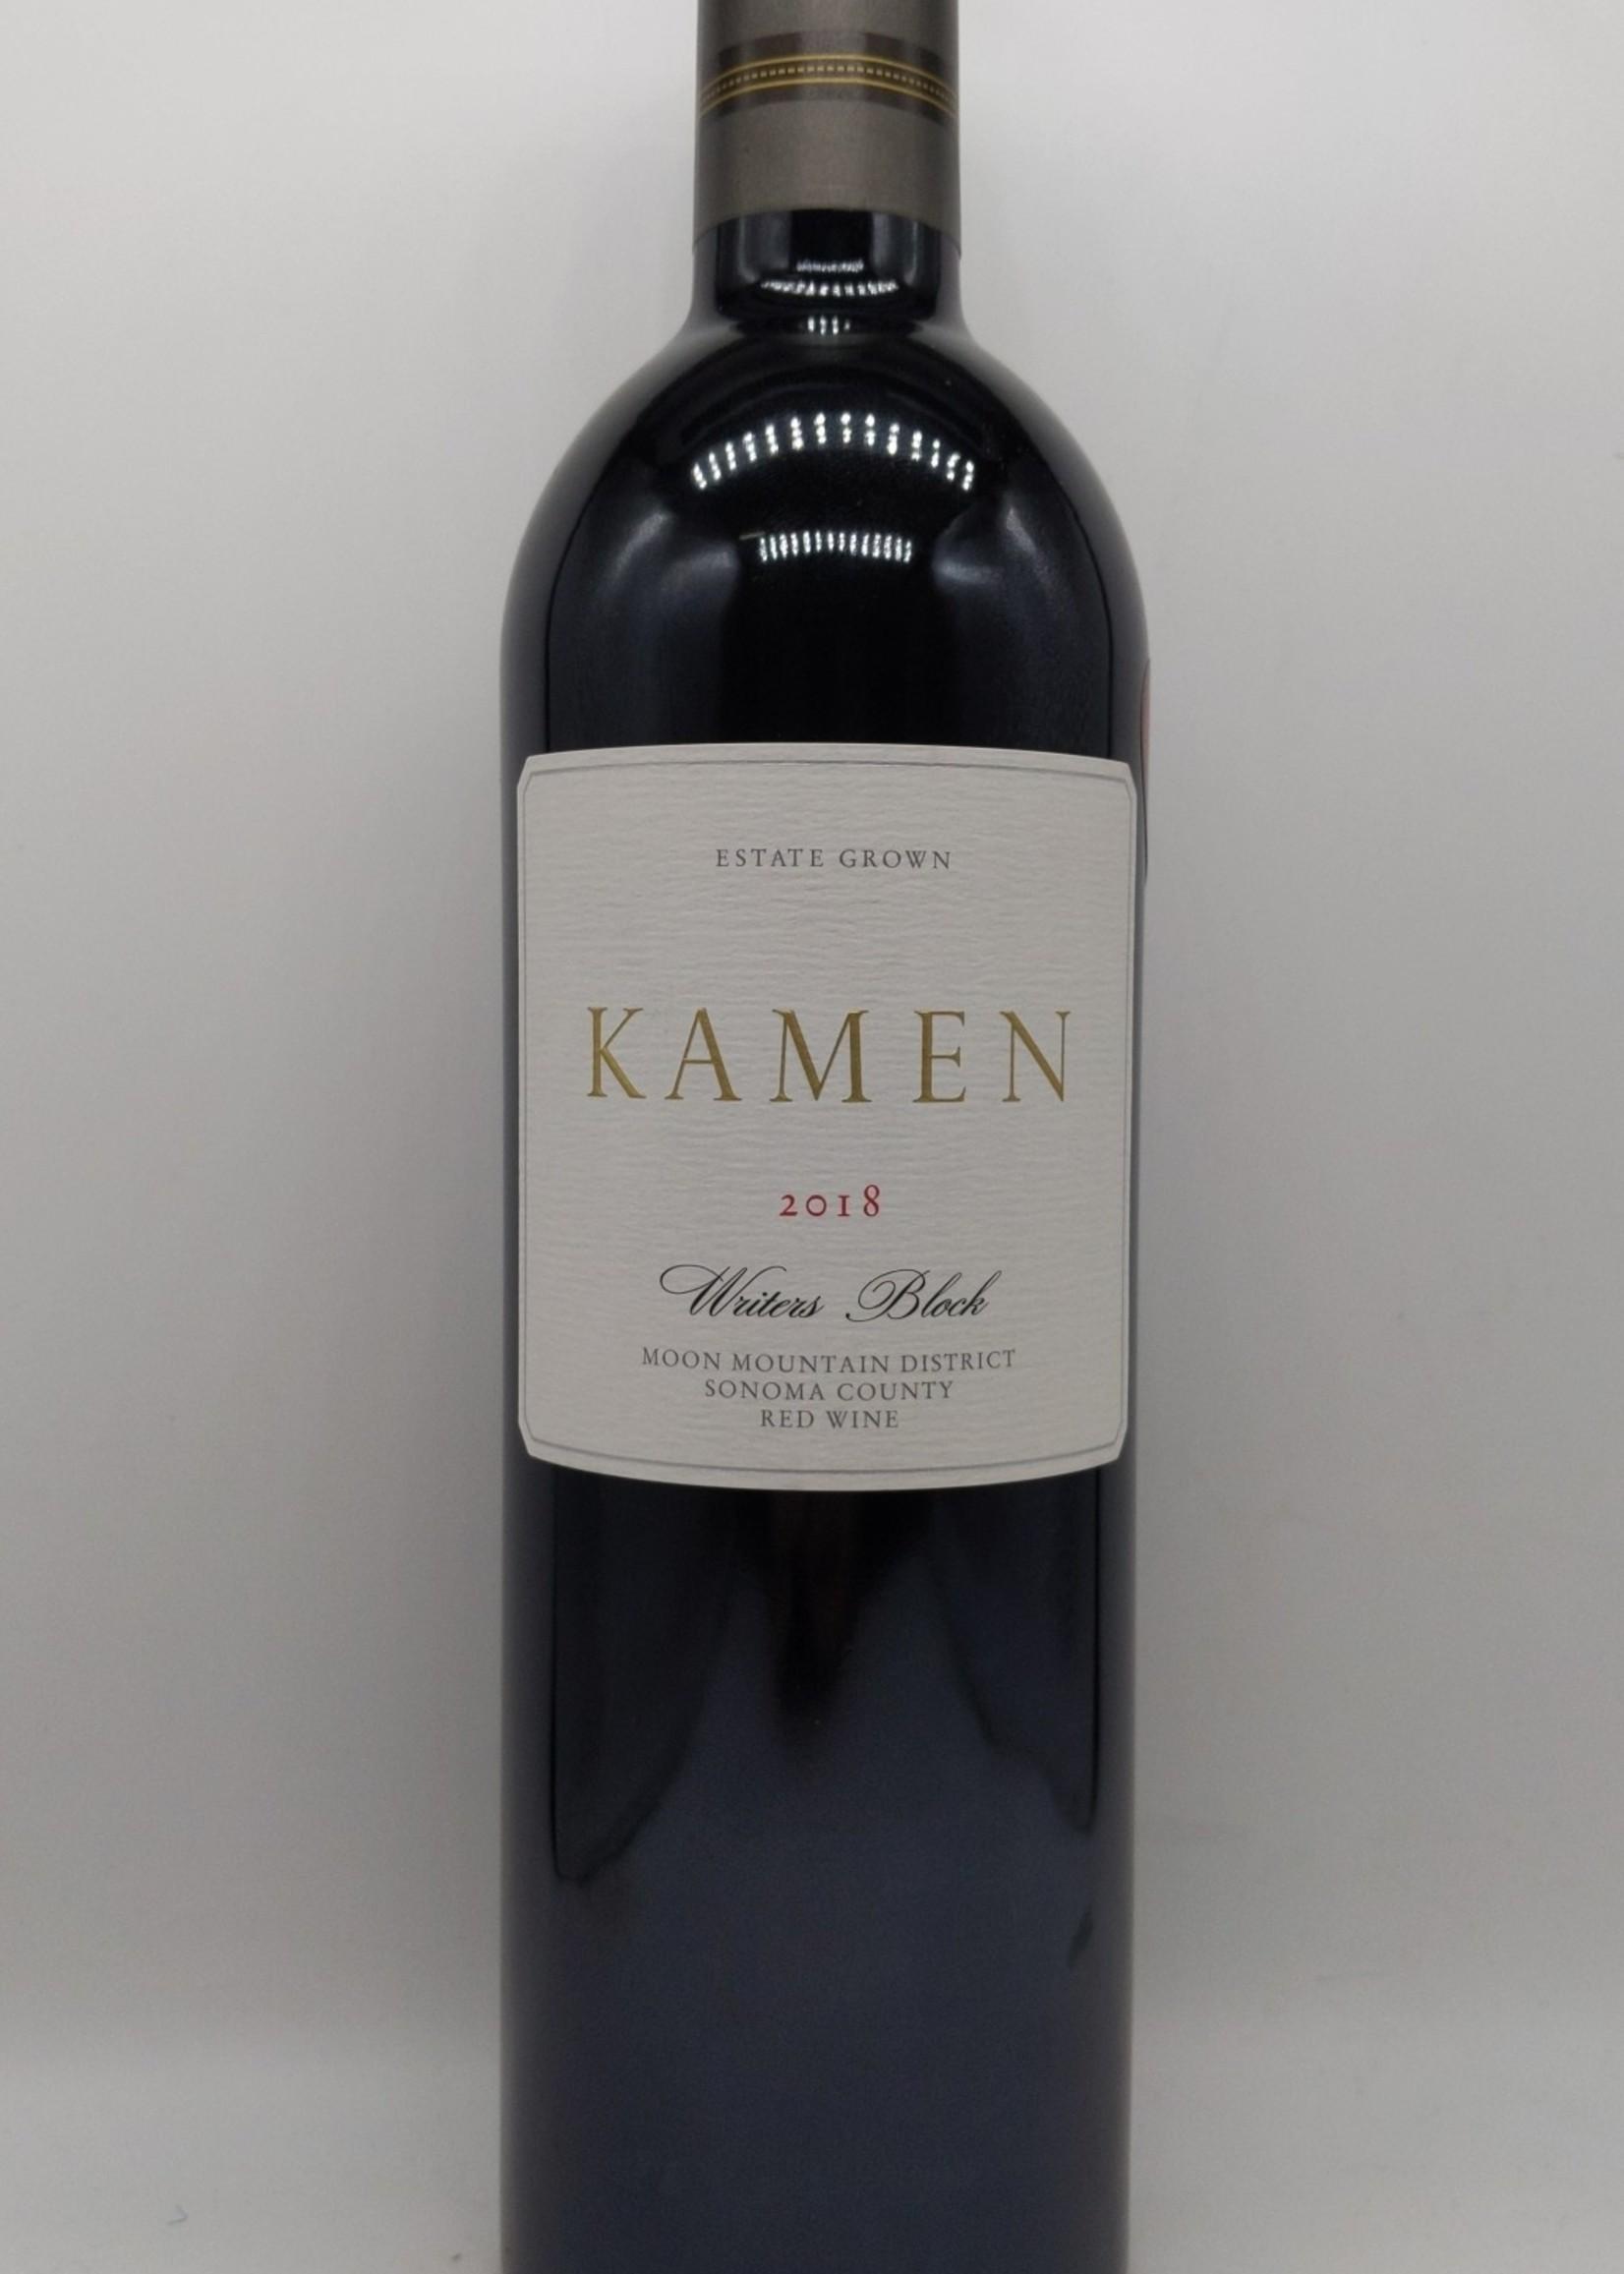 2018 KAMEN WRITERS BLOCK RED MOON MOUNTAIN DISTRICT 750ml